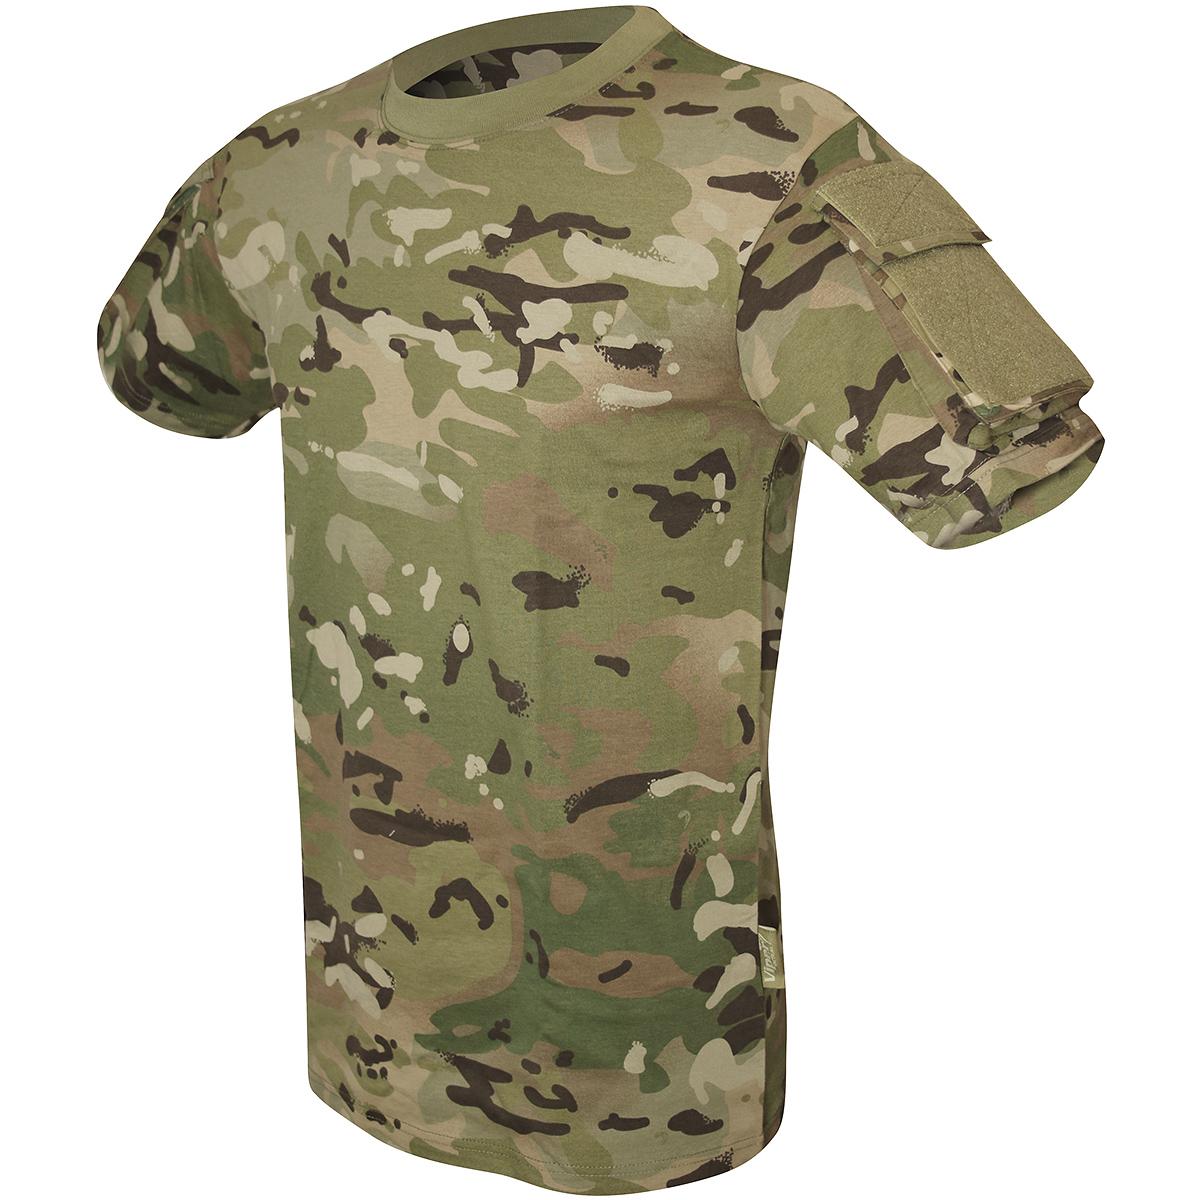 viper tactical military combat t shirt mens airsoft hunting cotton v